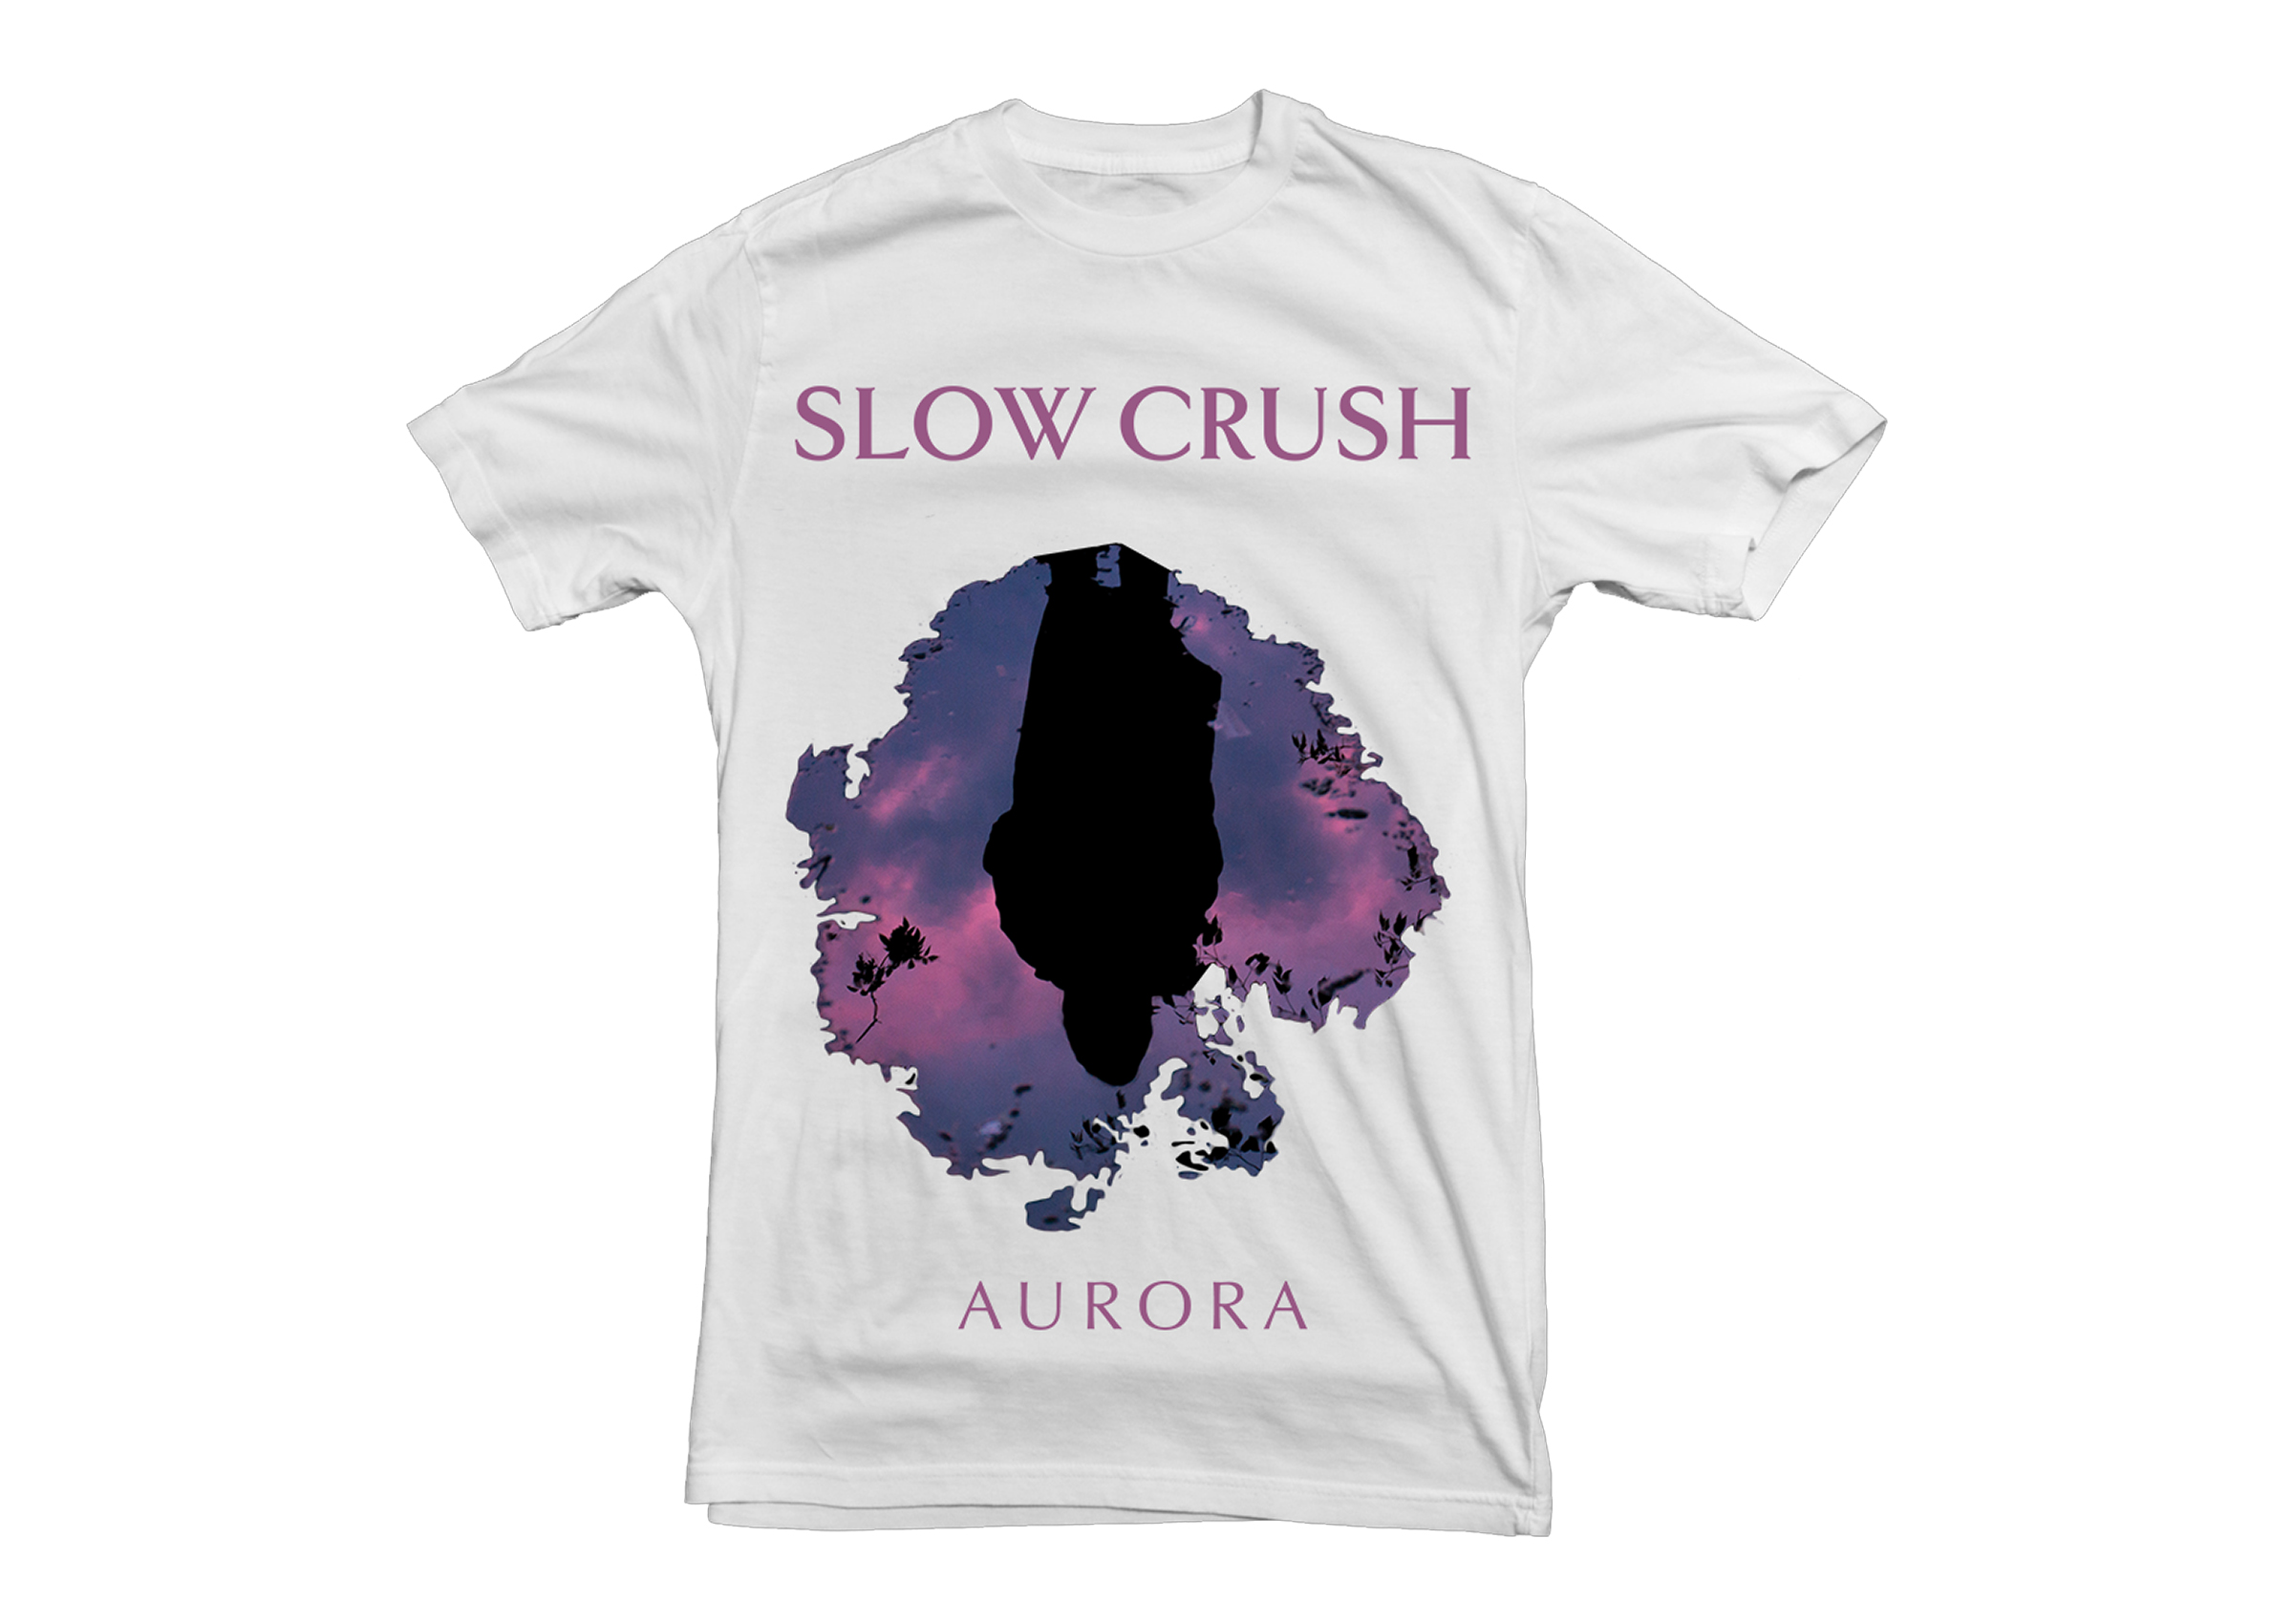 Slow Crush - Aurora shirt PREORDER